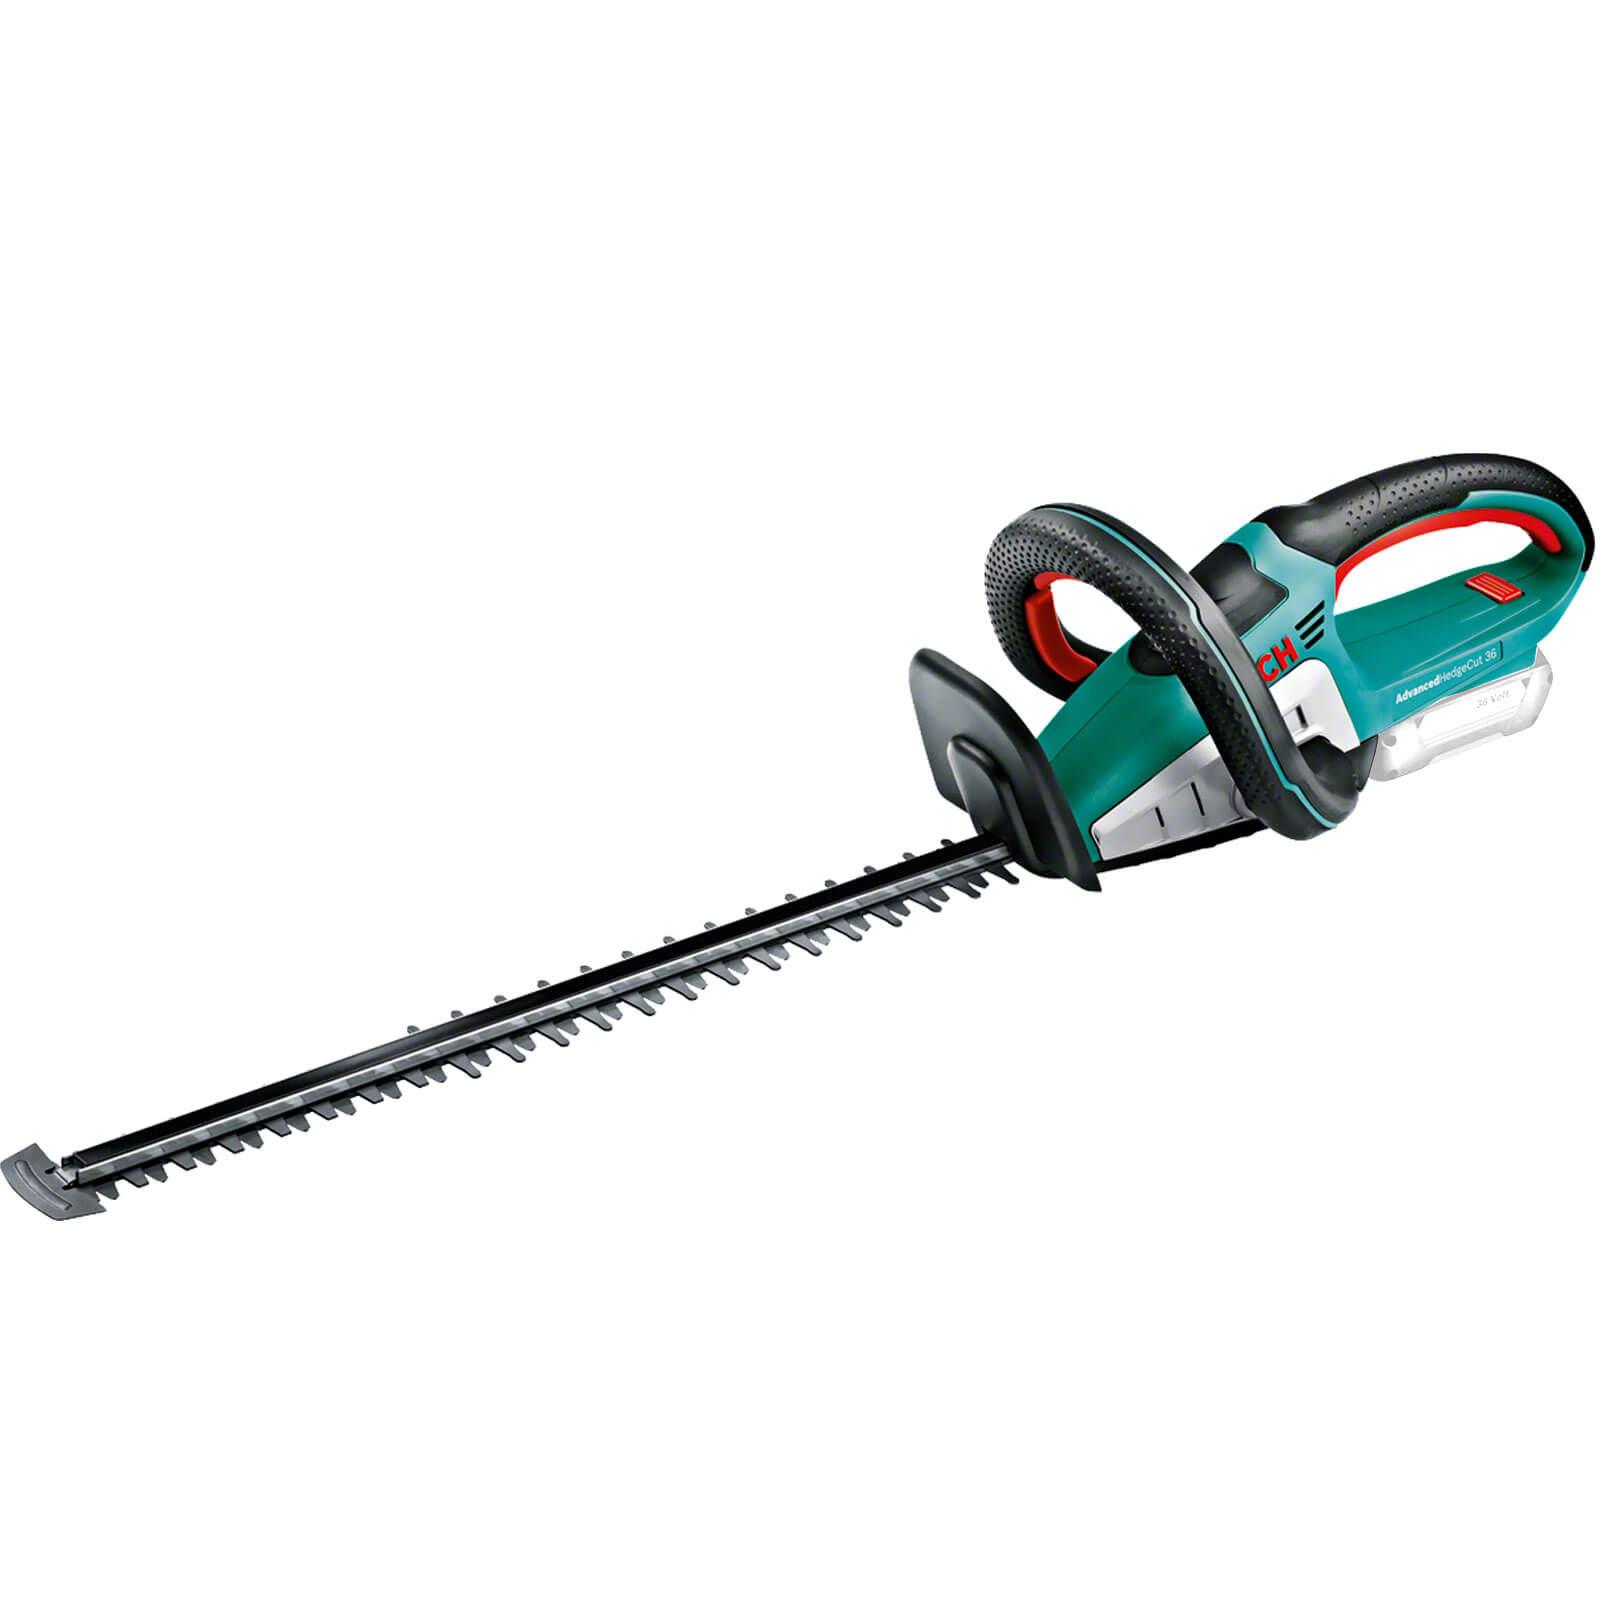 Bosch ADVANCEDHEDGECUT 36v Cordless Hedge Trimmer 540mm No Batteries No Charger